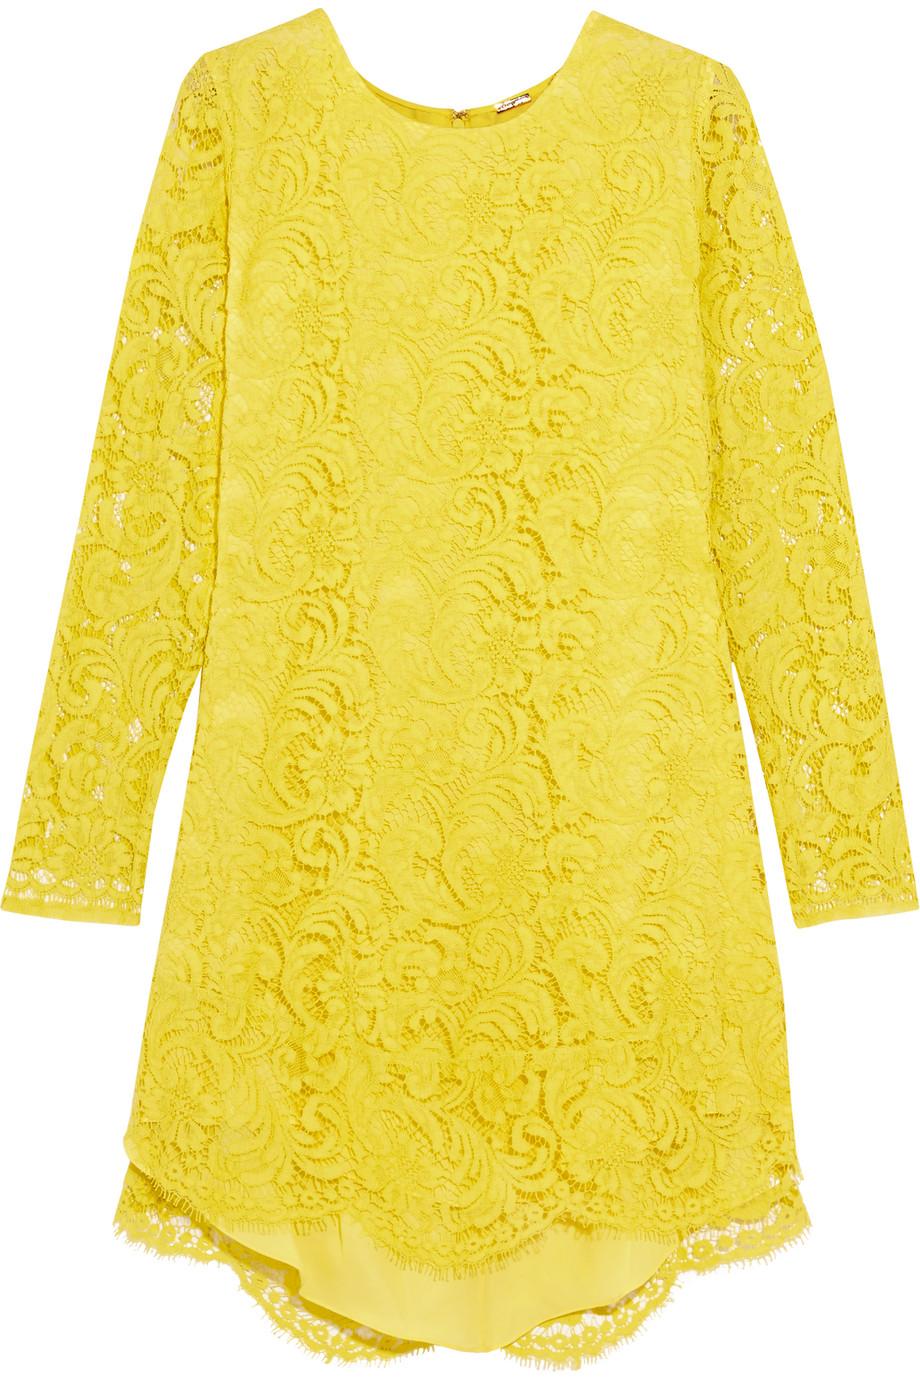 Adam Lippes Corded Lace Mini Dress, Chartreuse, Women's, Size: 10